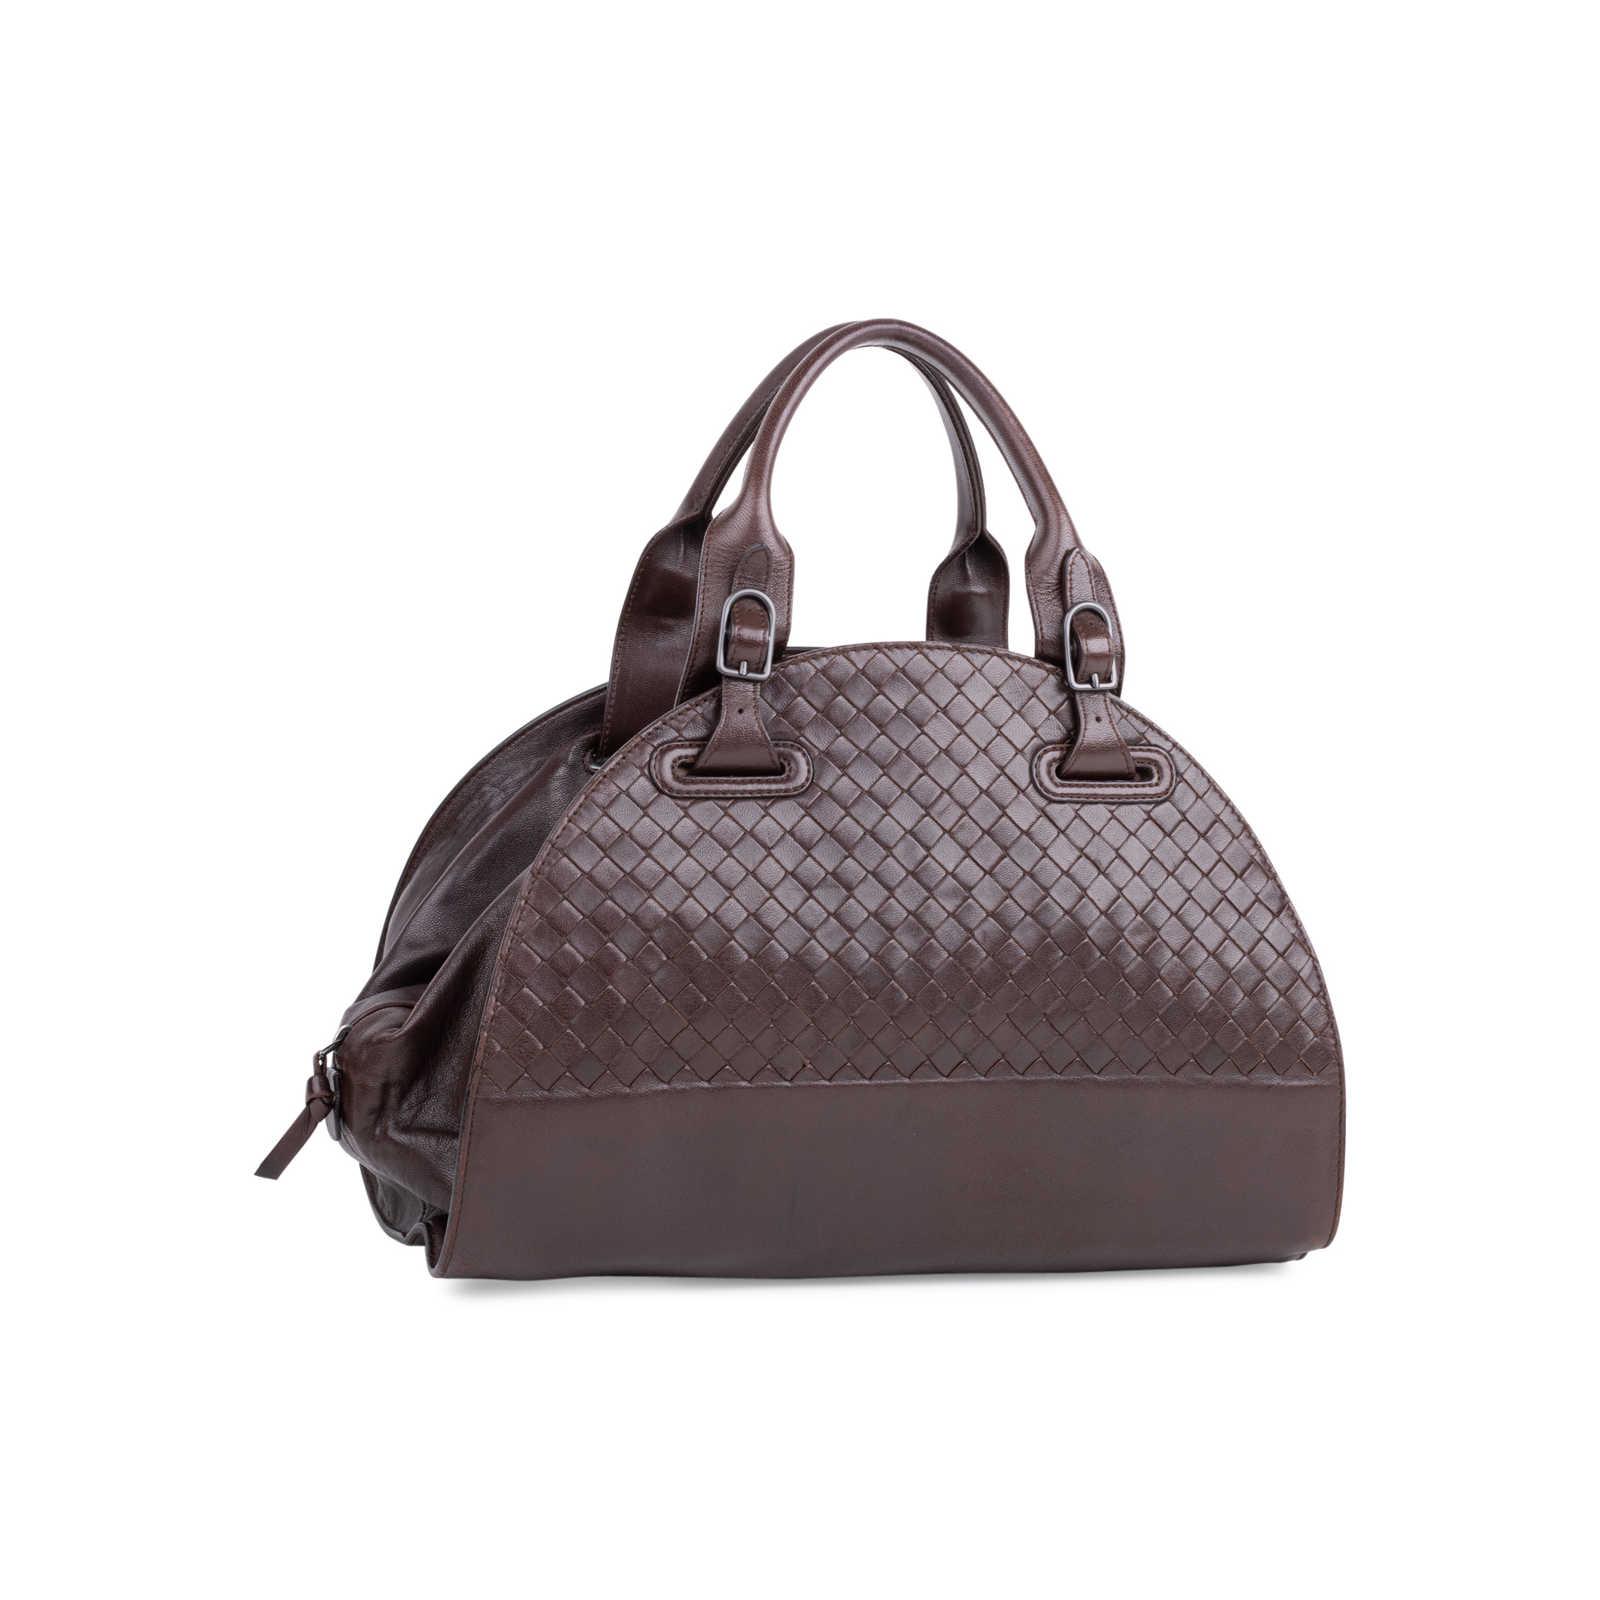 beb4a29c6958f ... Authentic Second Hand Bottega Veneta Woven Bowler Bag (PSS-577-00011)  ...